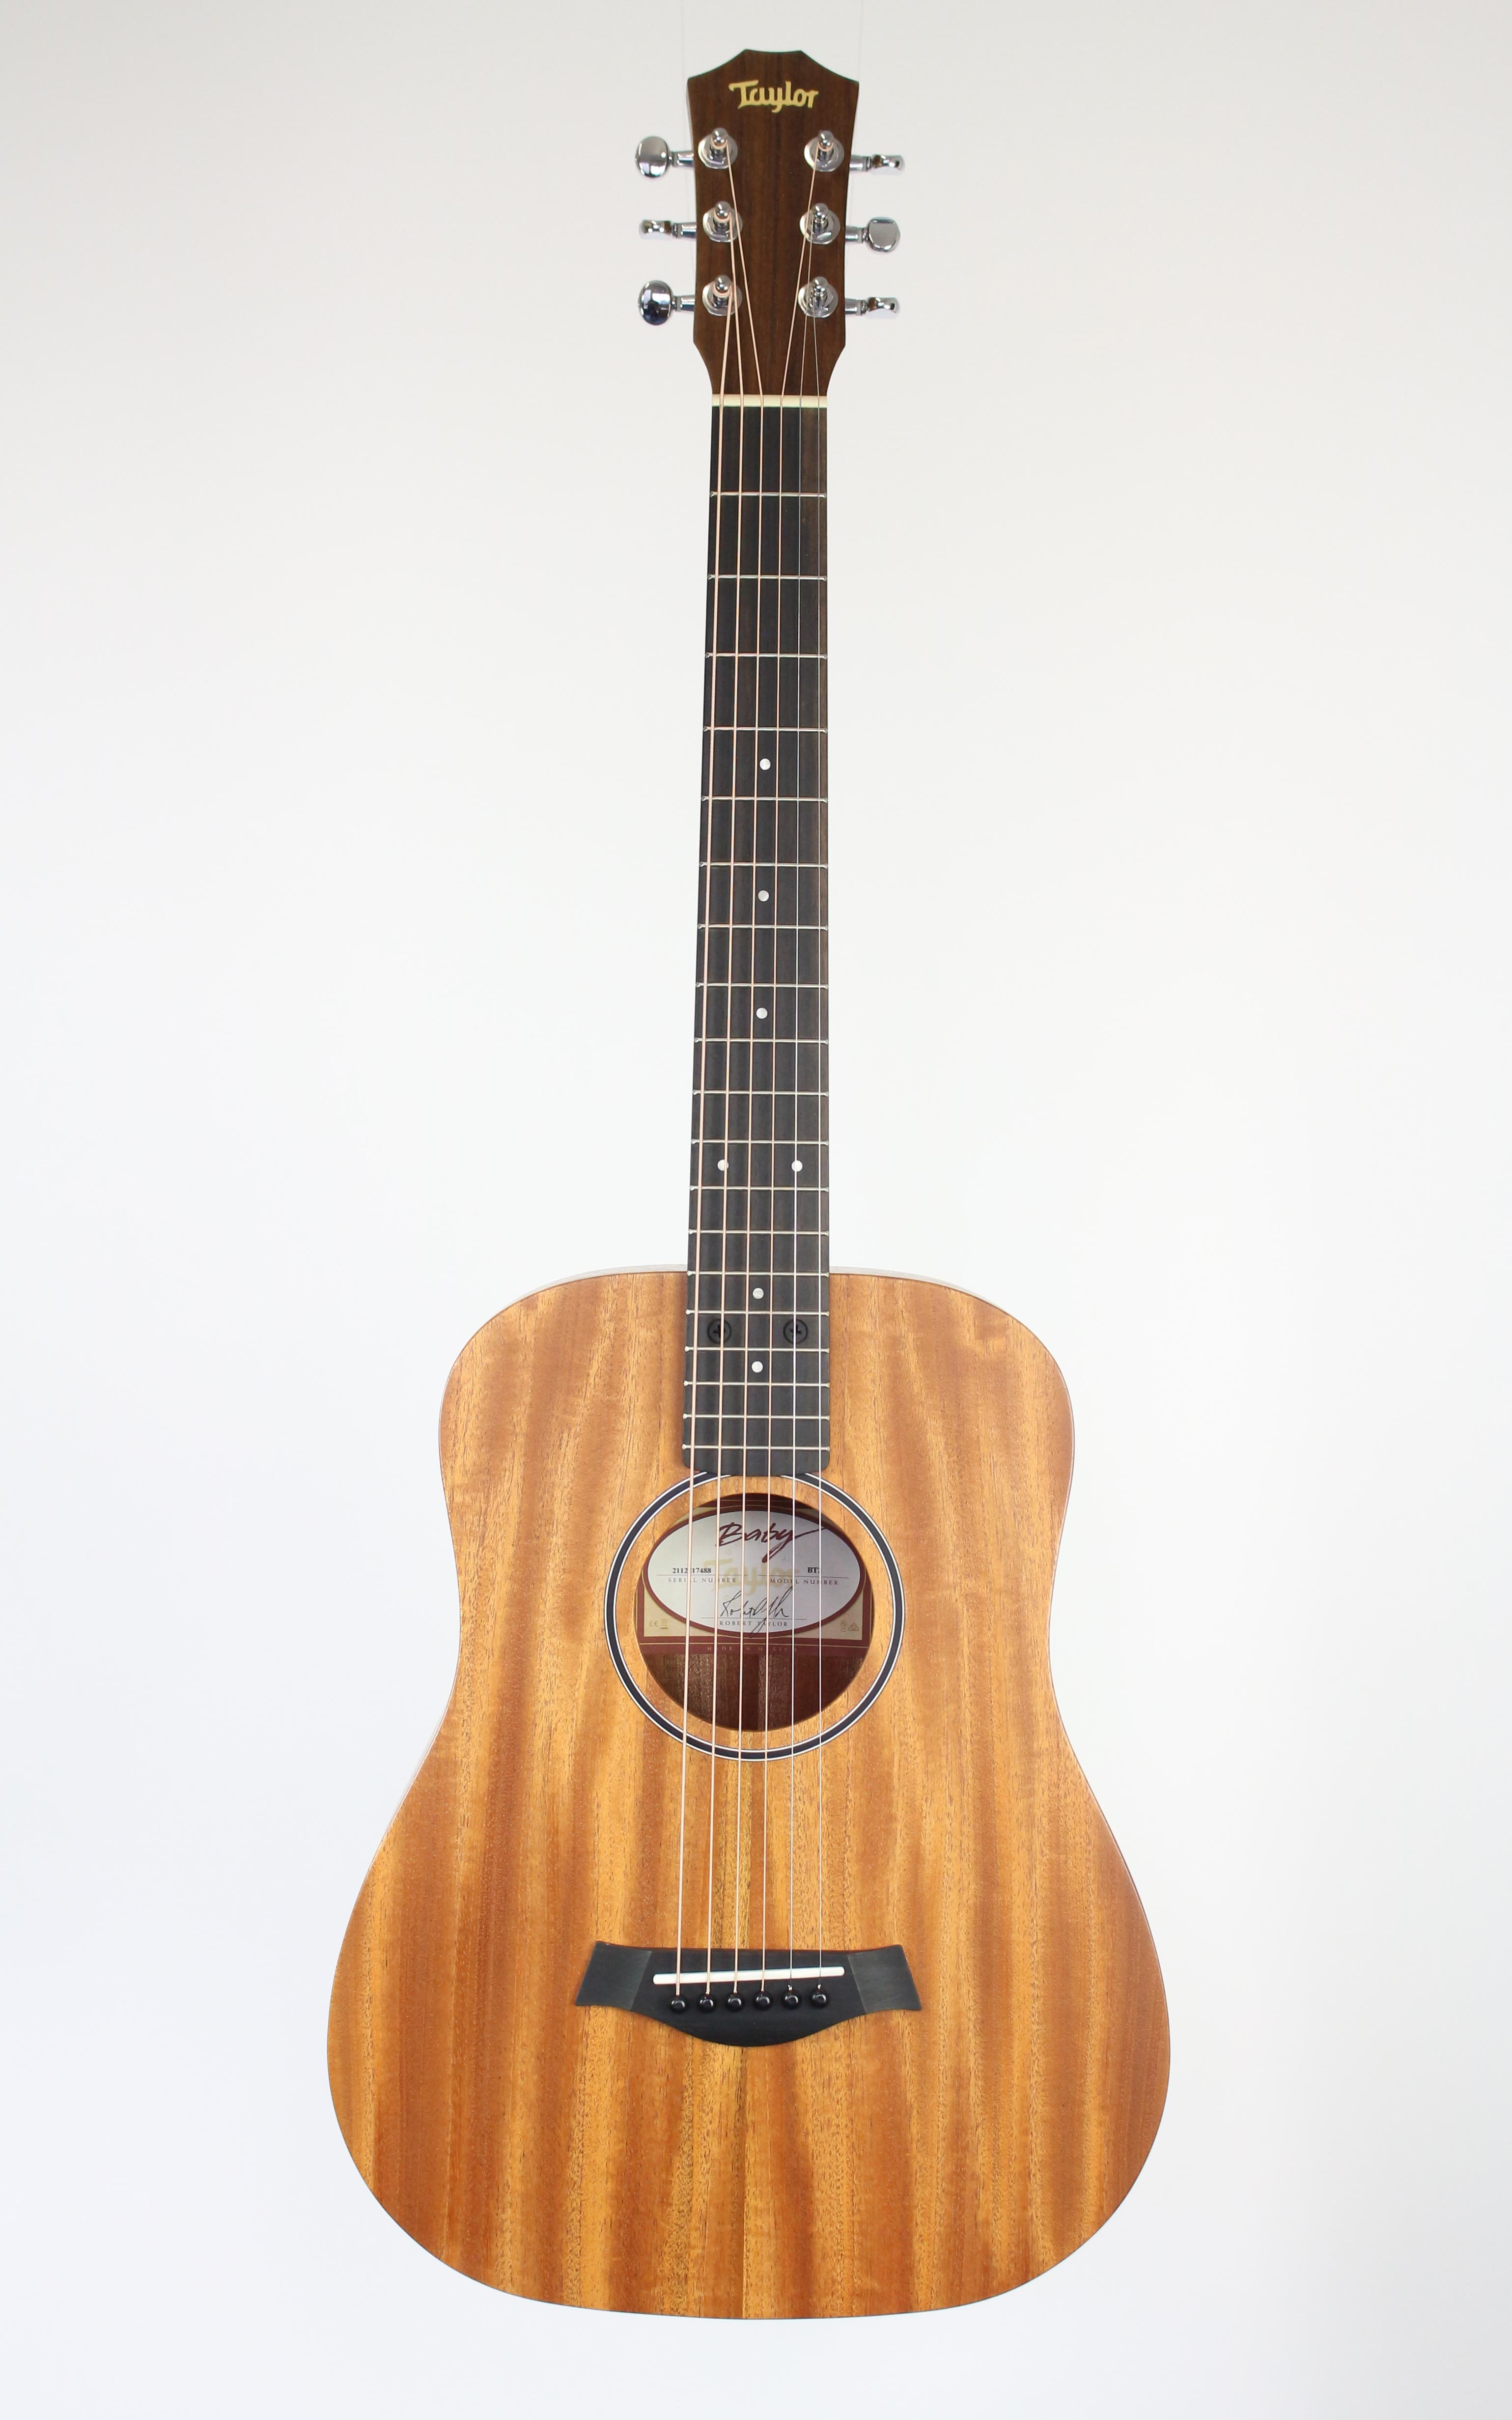 Taylor - BT2 Baby Taylor Mahogani - Gitarren - Westerngitarren | MUSIK BERTRAM Deutschland Freiburg